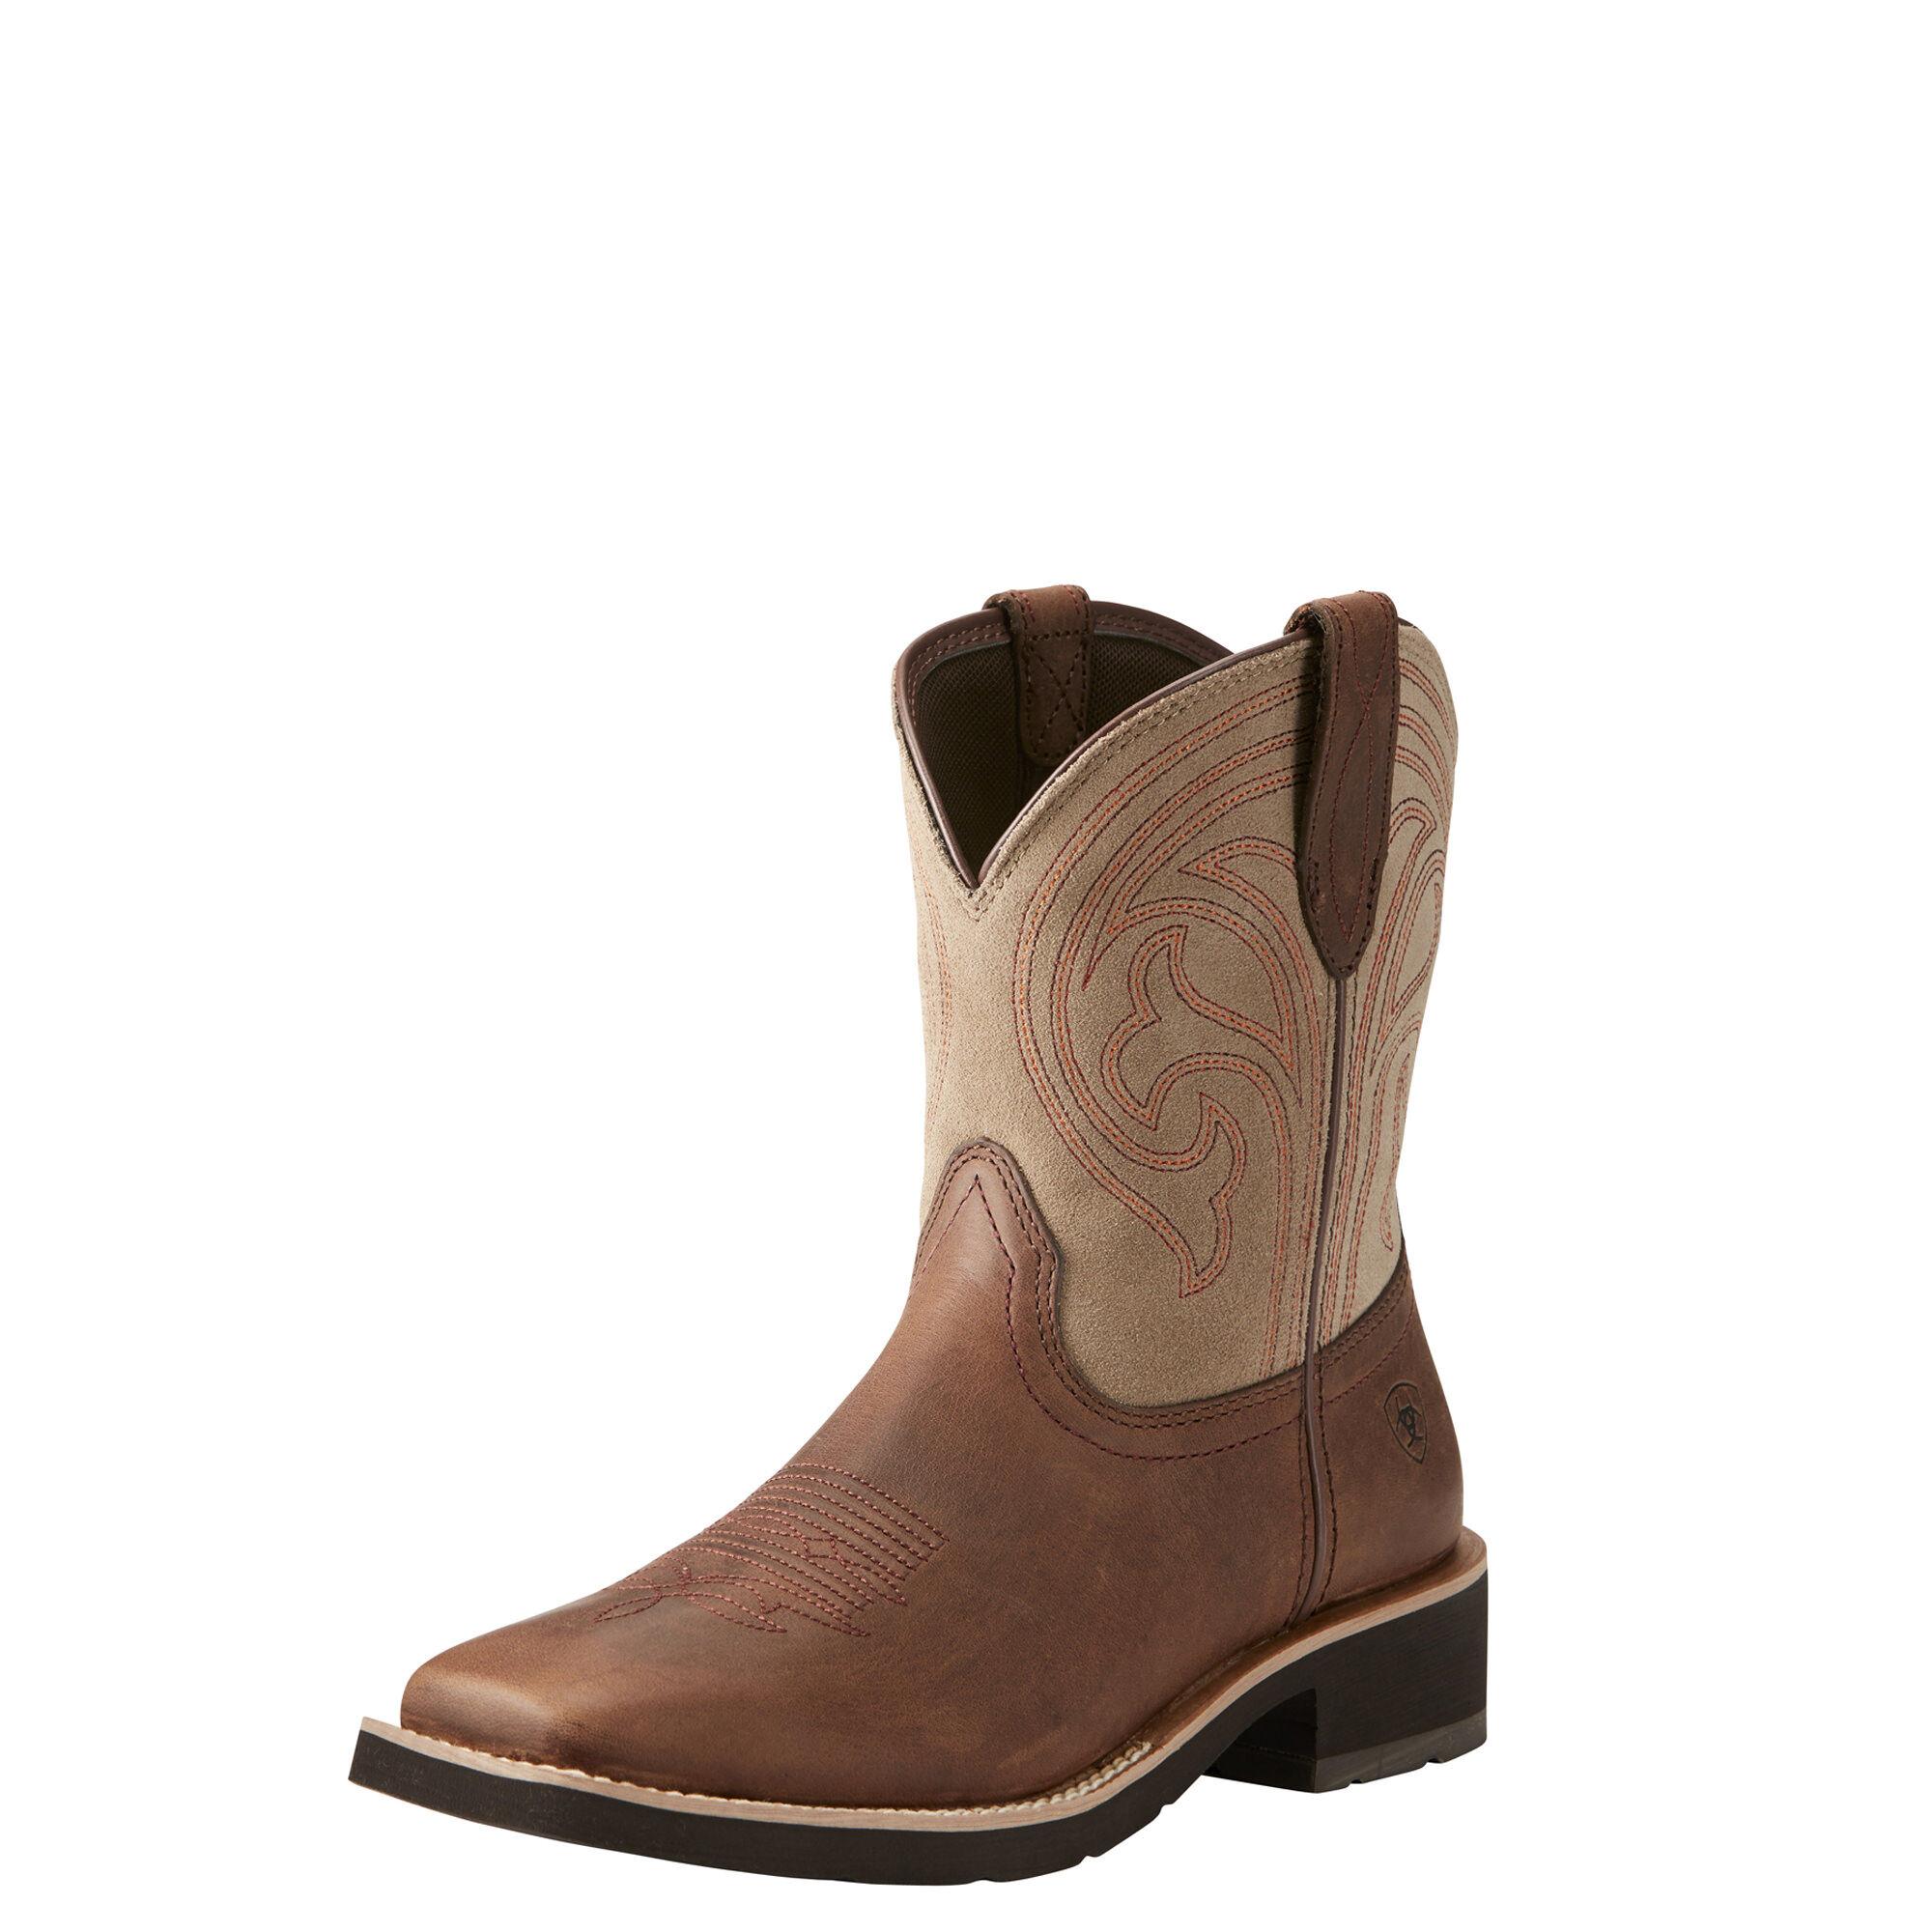 Shawnee Western Boot